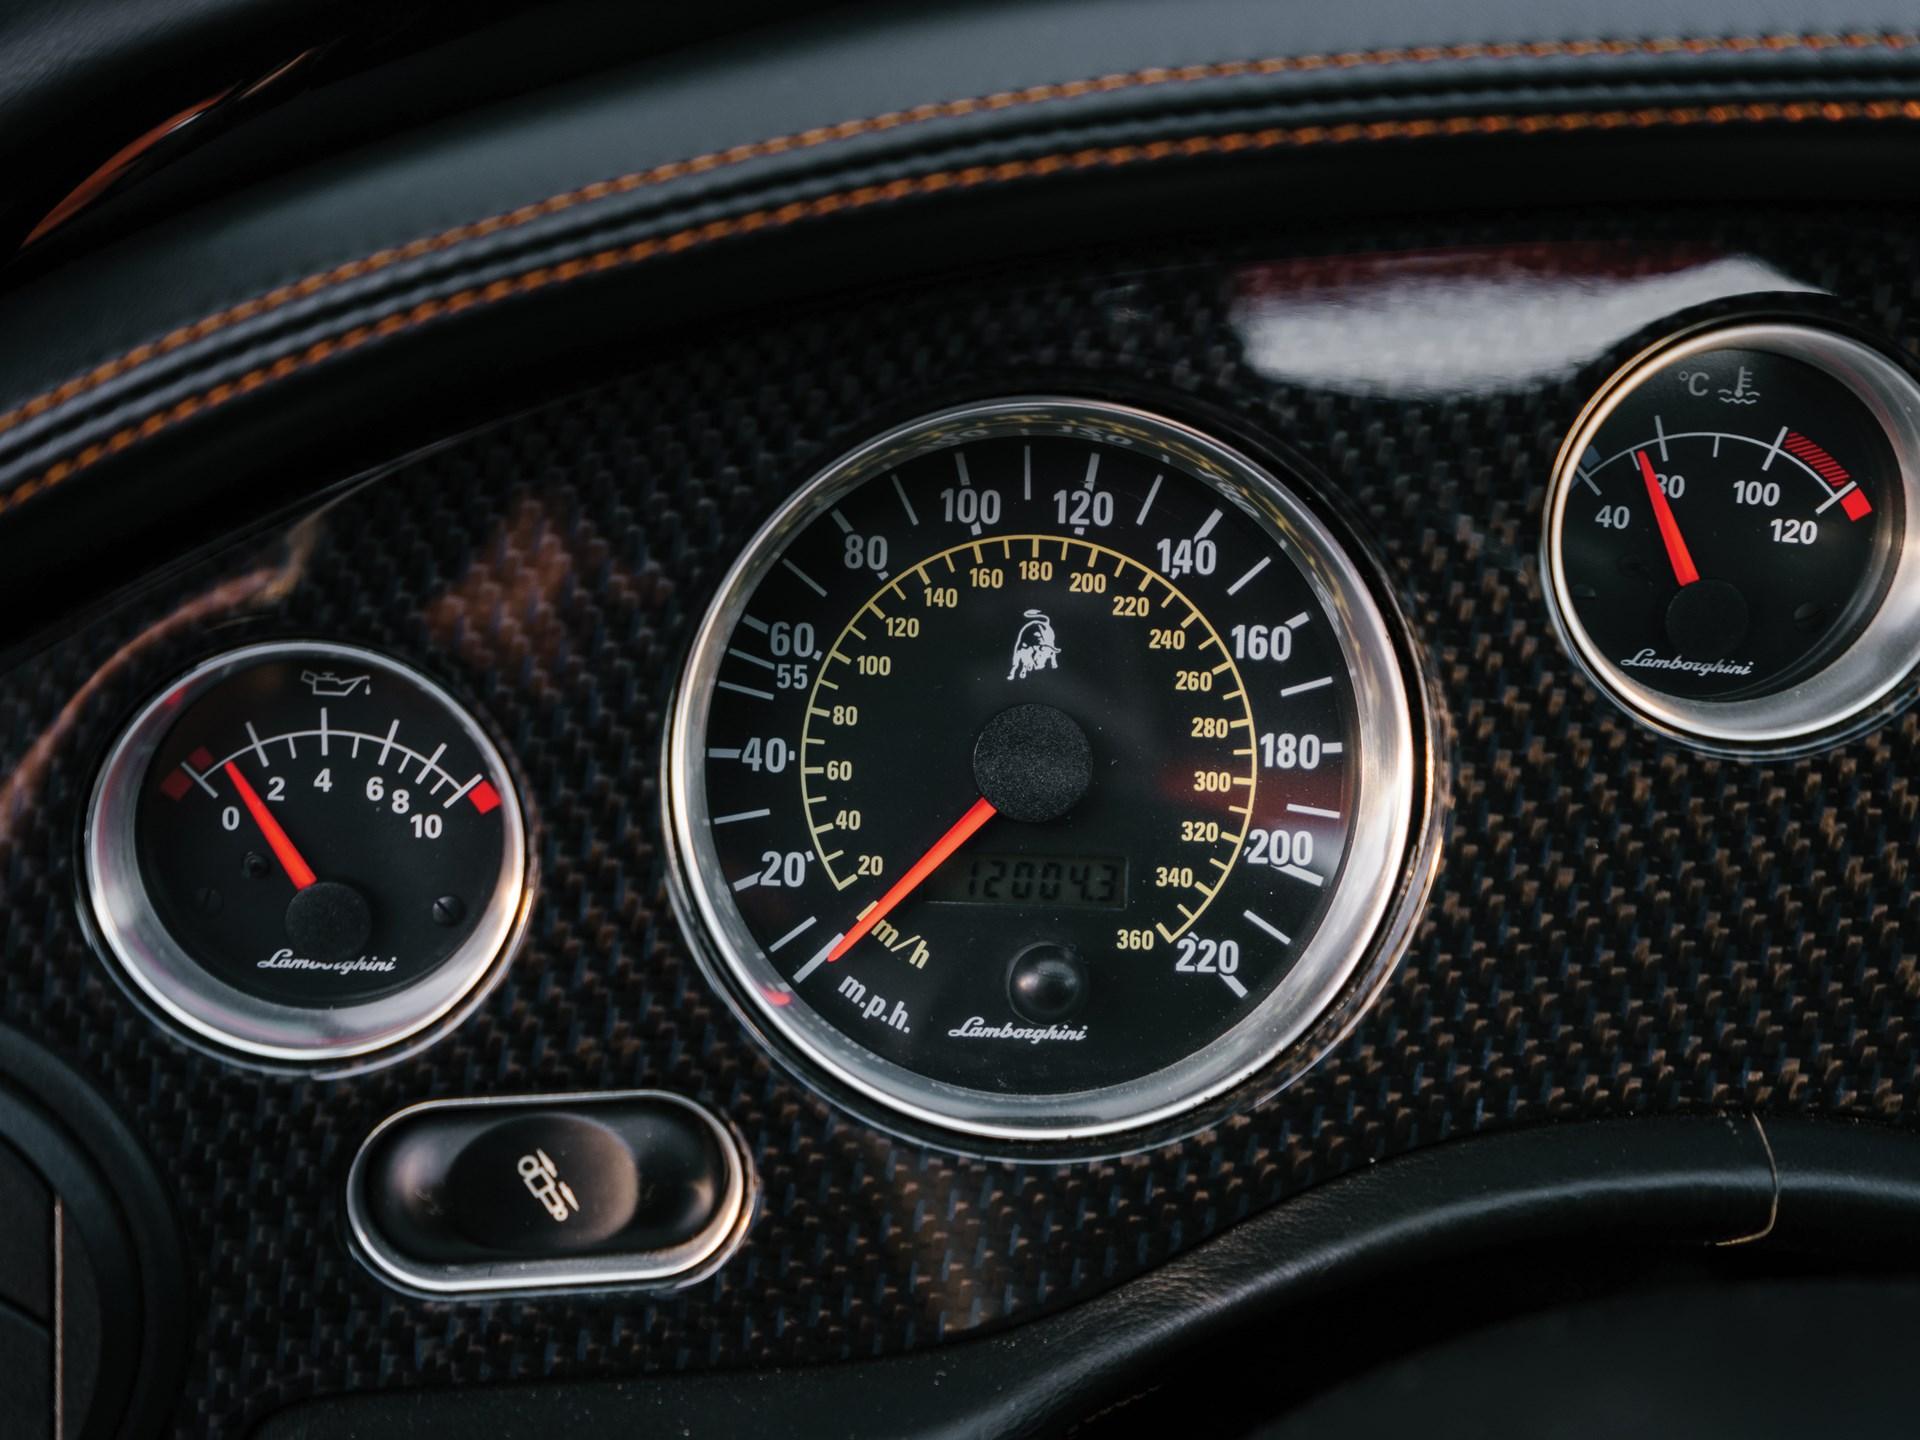 2001 Lamborghini Diablo VT 6.0